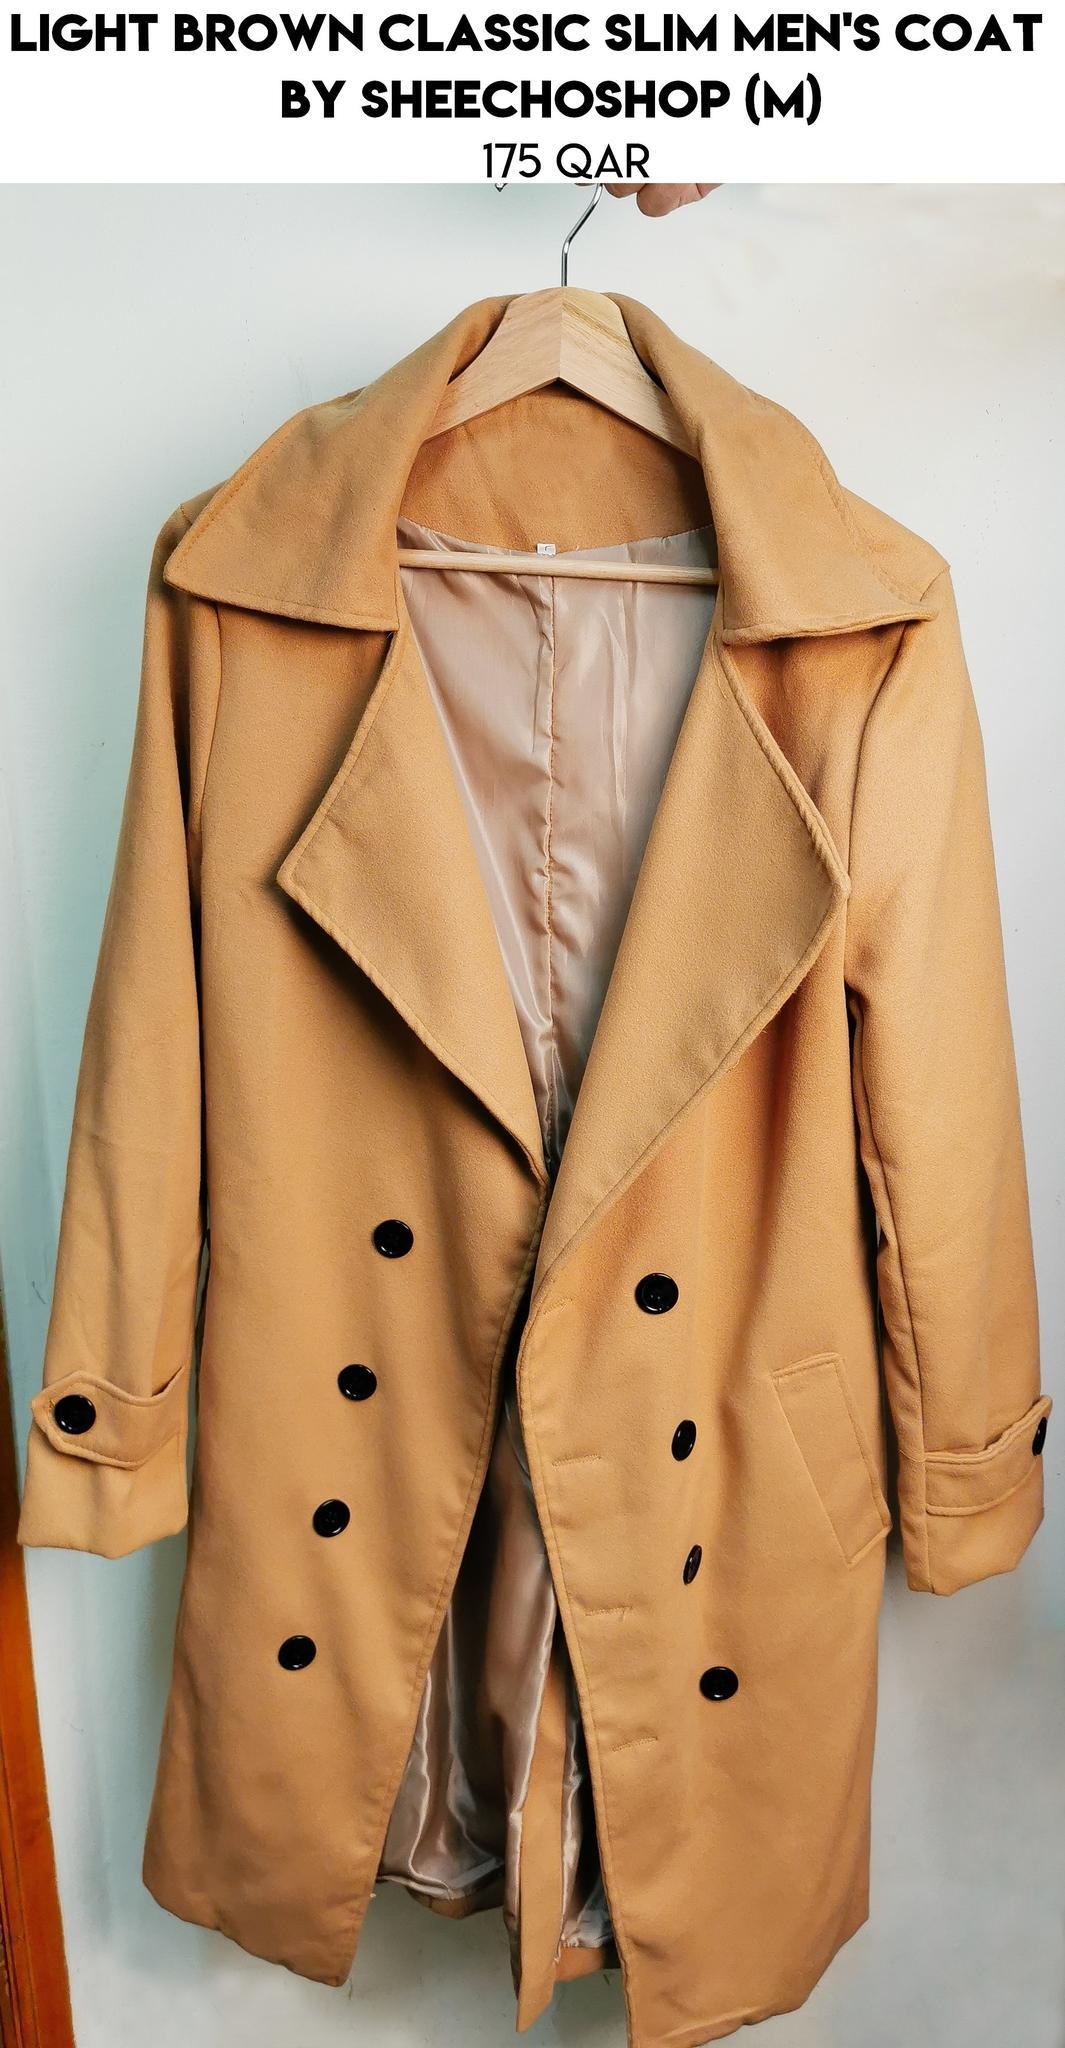 Light Brown Classic Slim Men's Coat by Sheechoshop